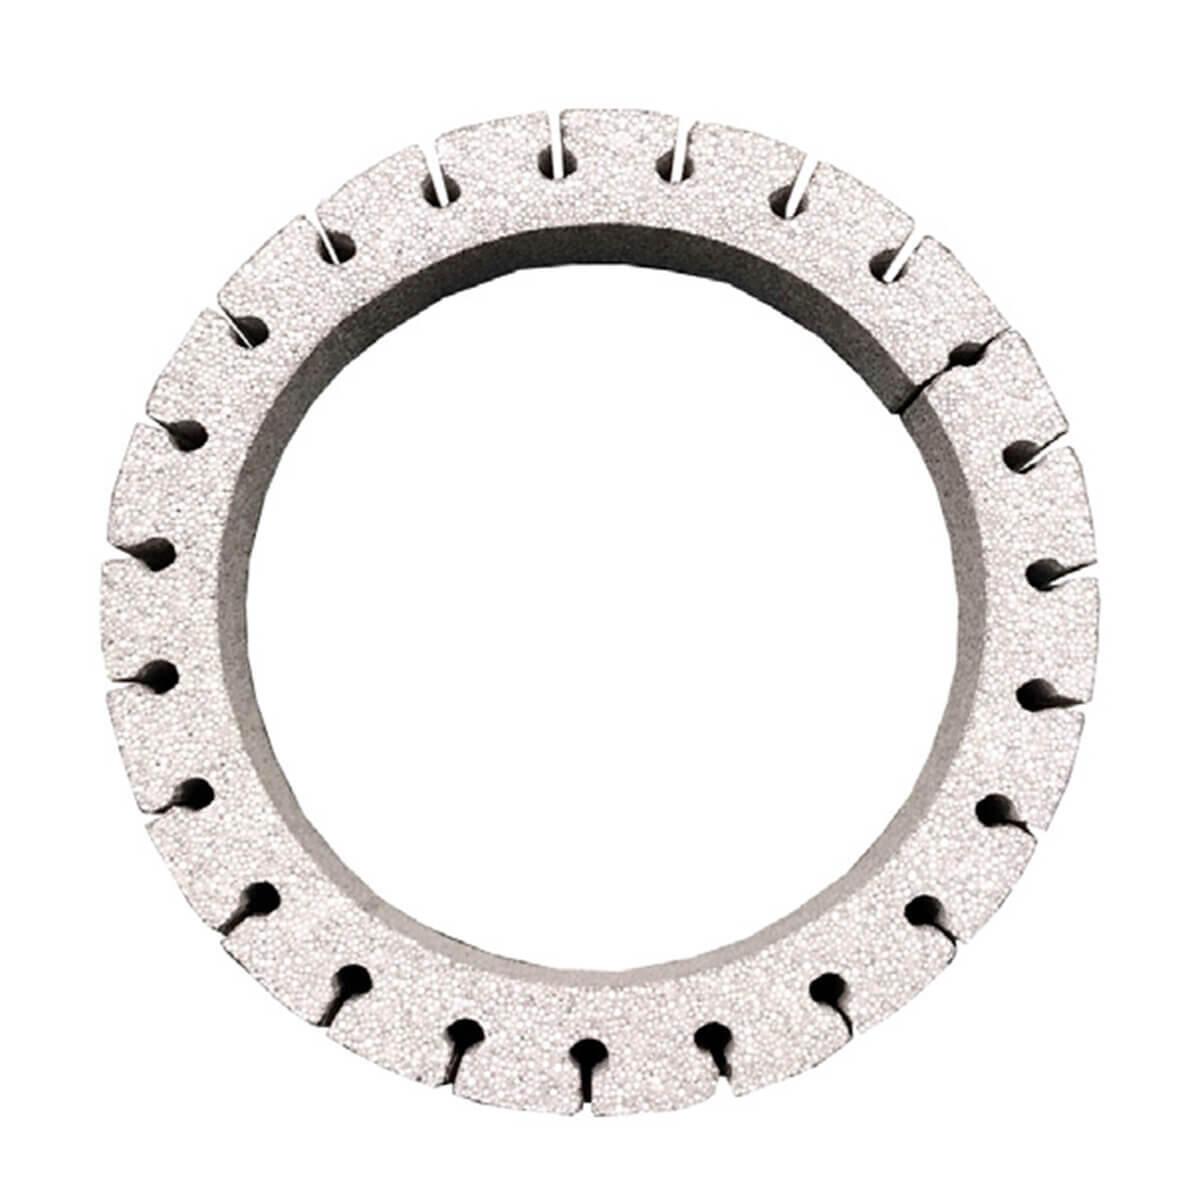 ToiletBan Perimeter Ring for Toilet Flange